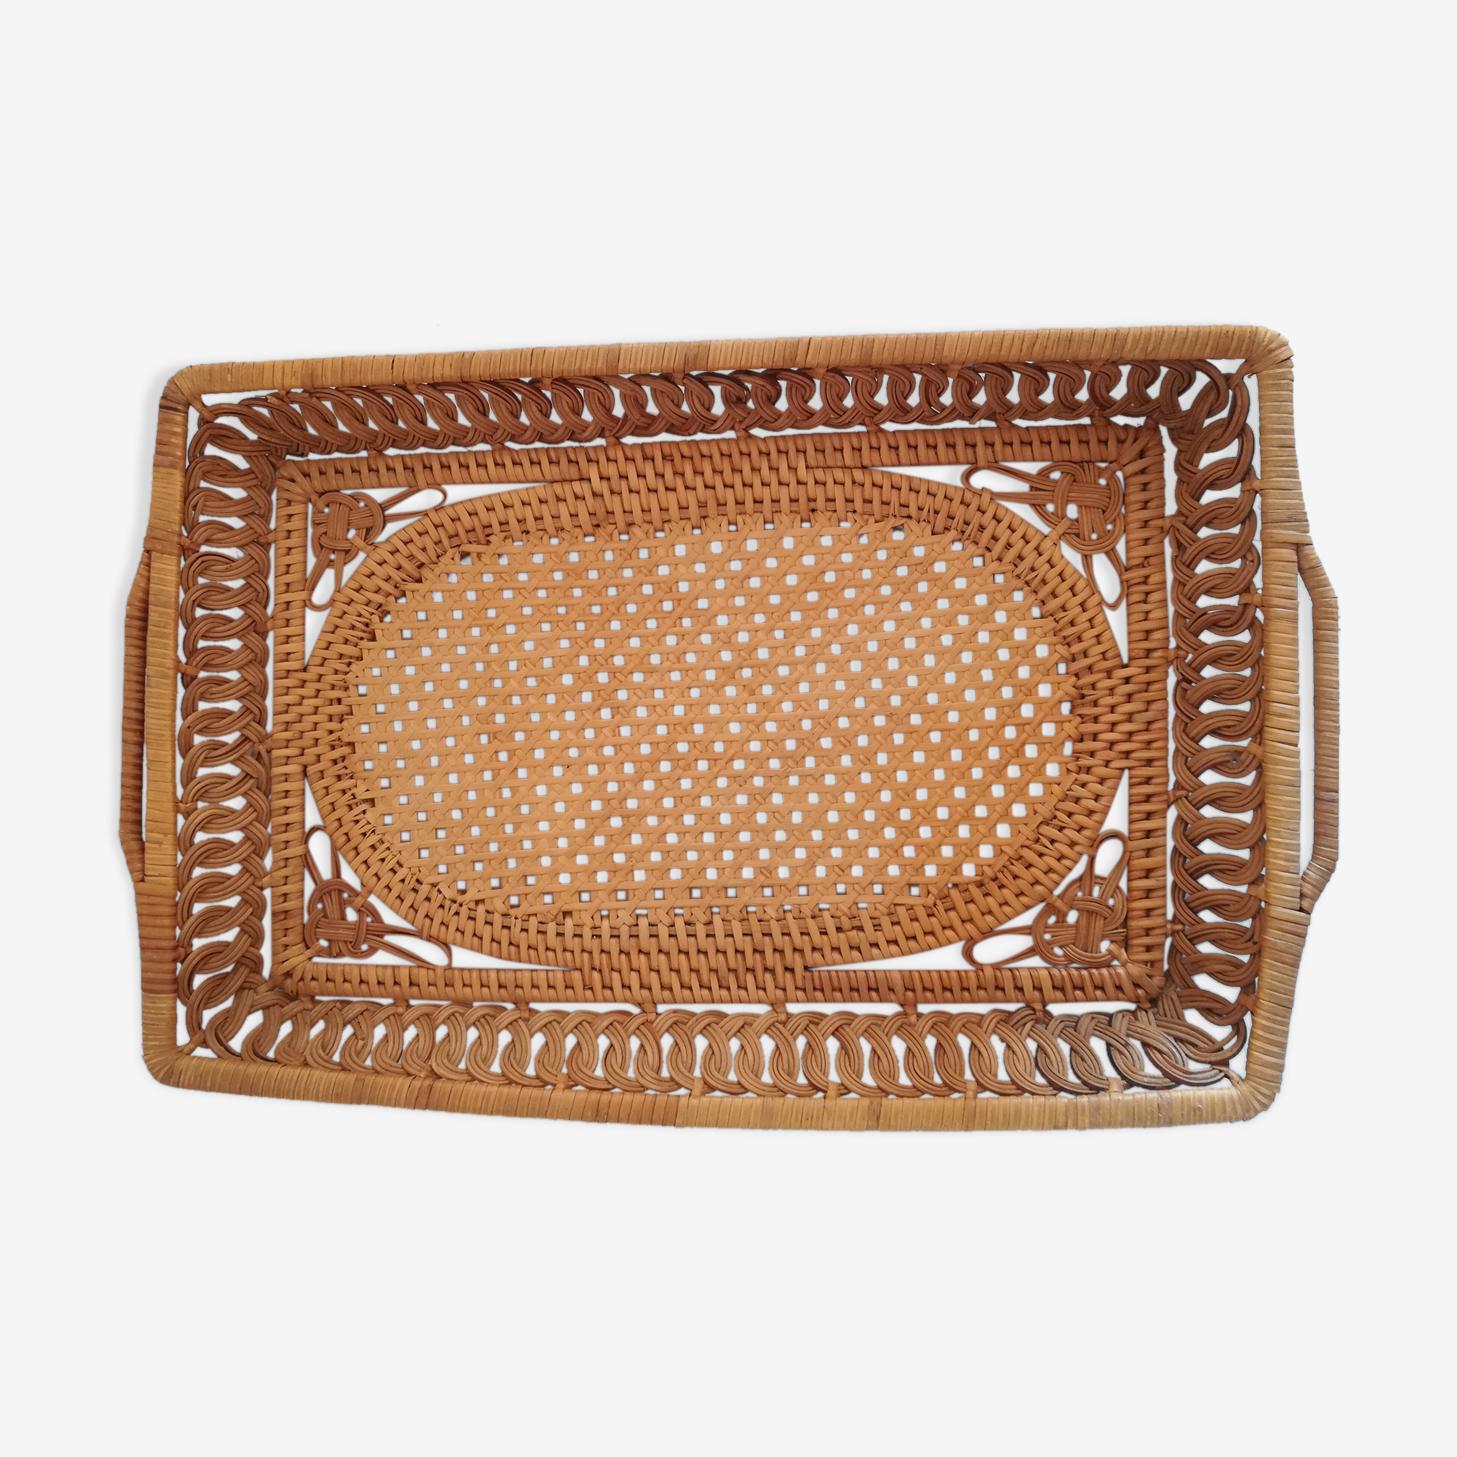 Old flat basket